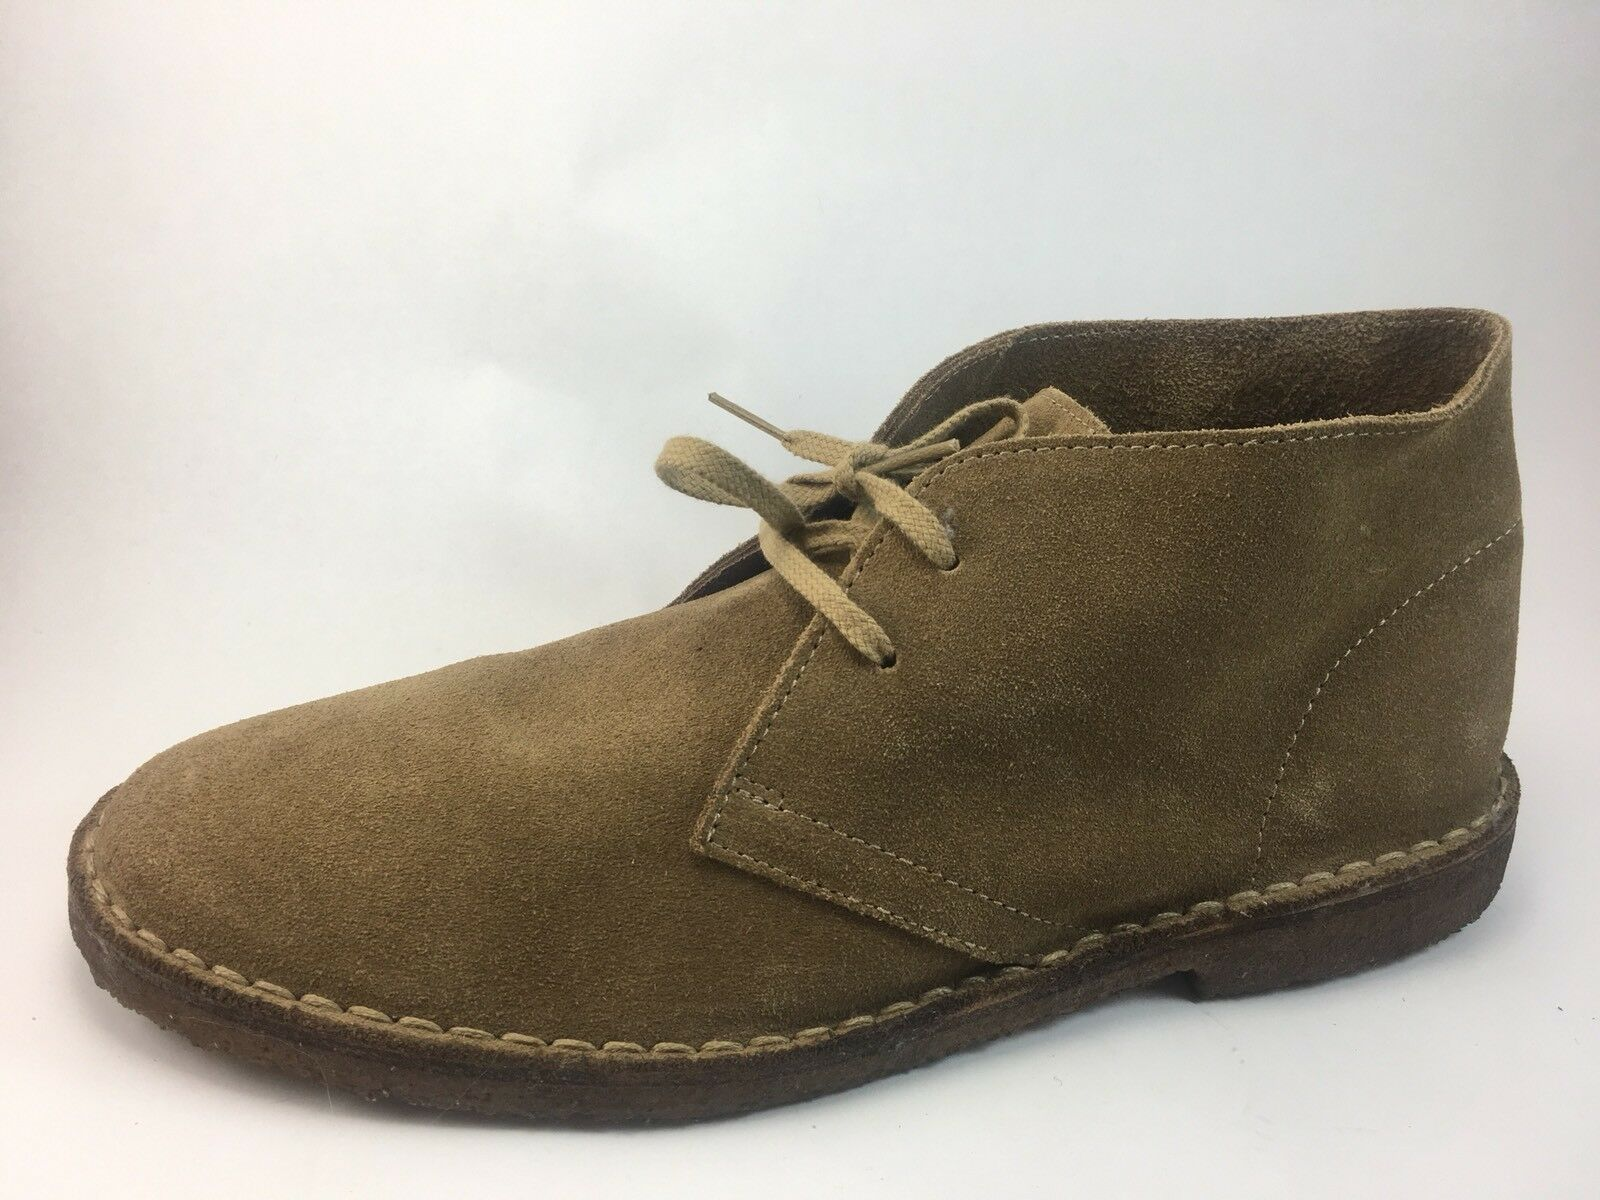 J Crew 79438 Men's Brown Suede Boots Size 10 148 m8